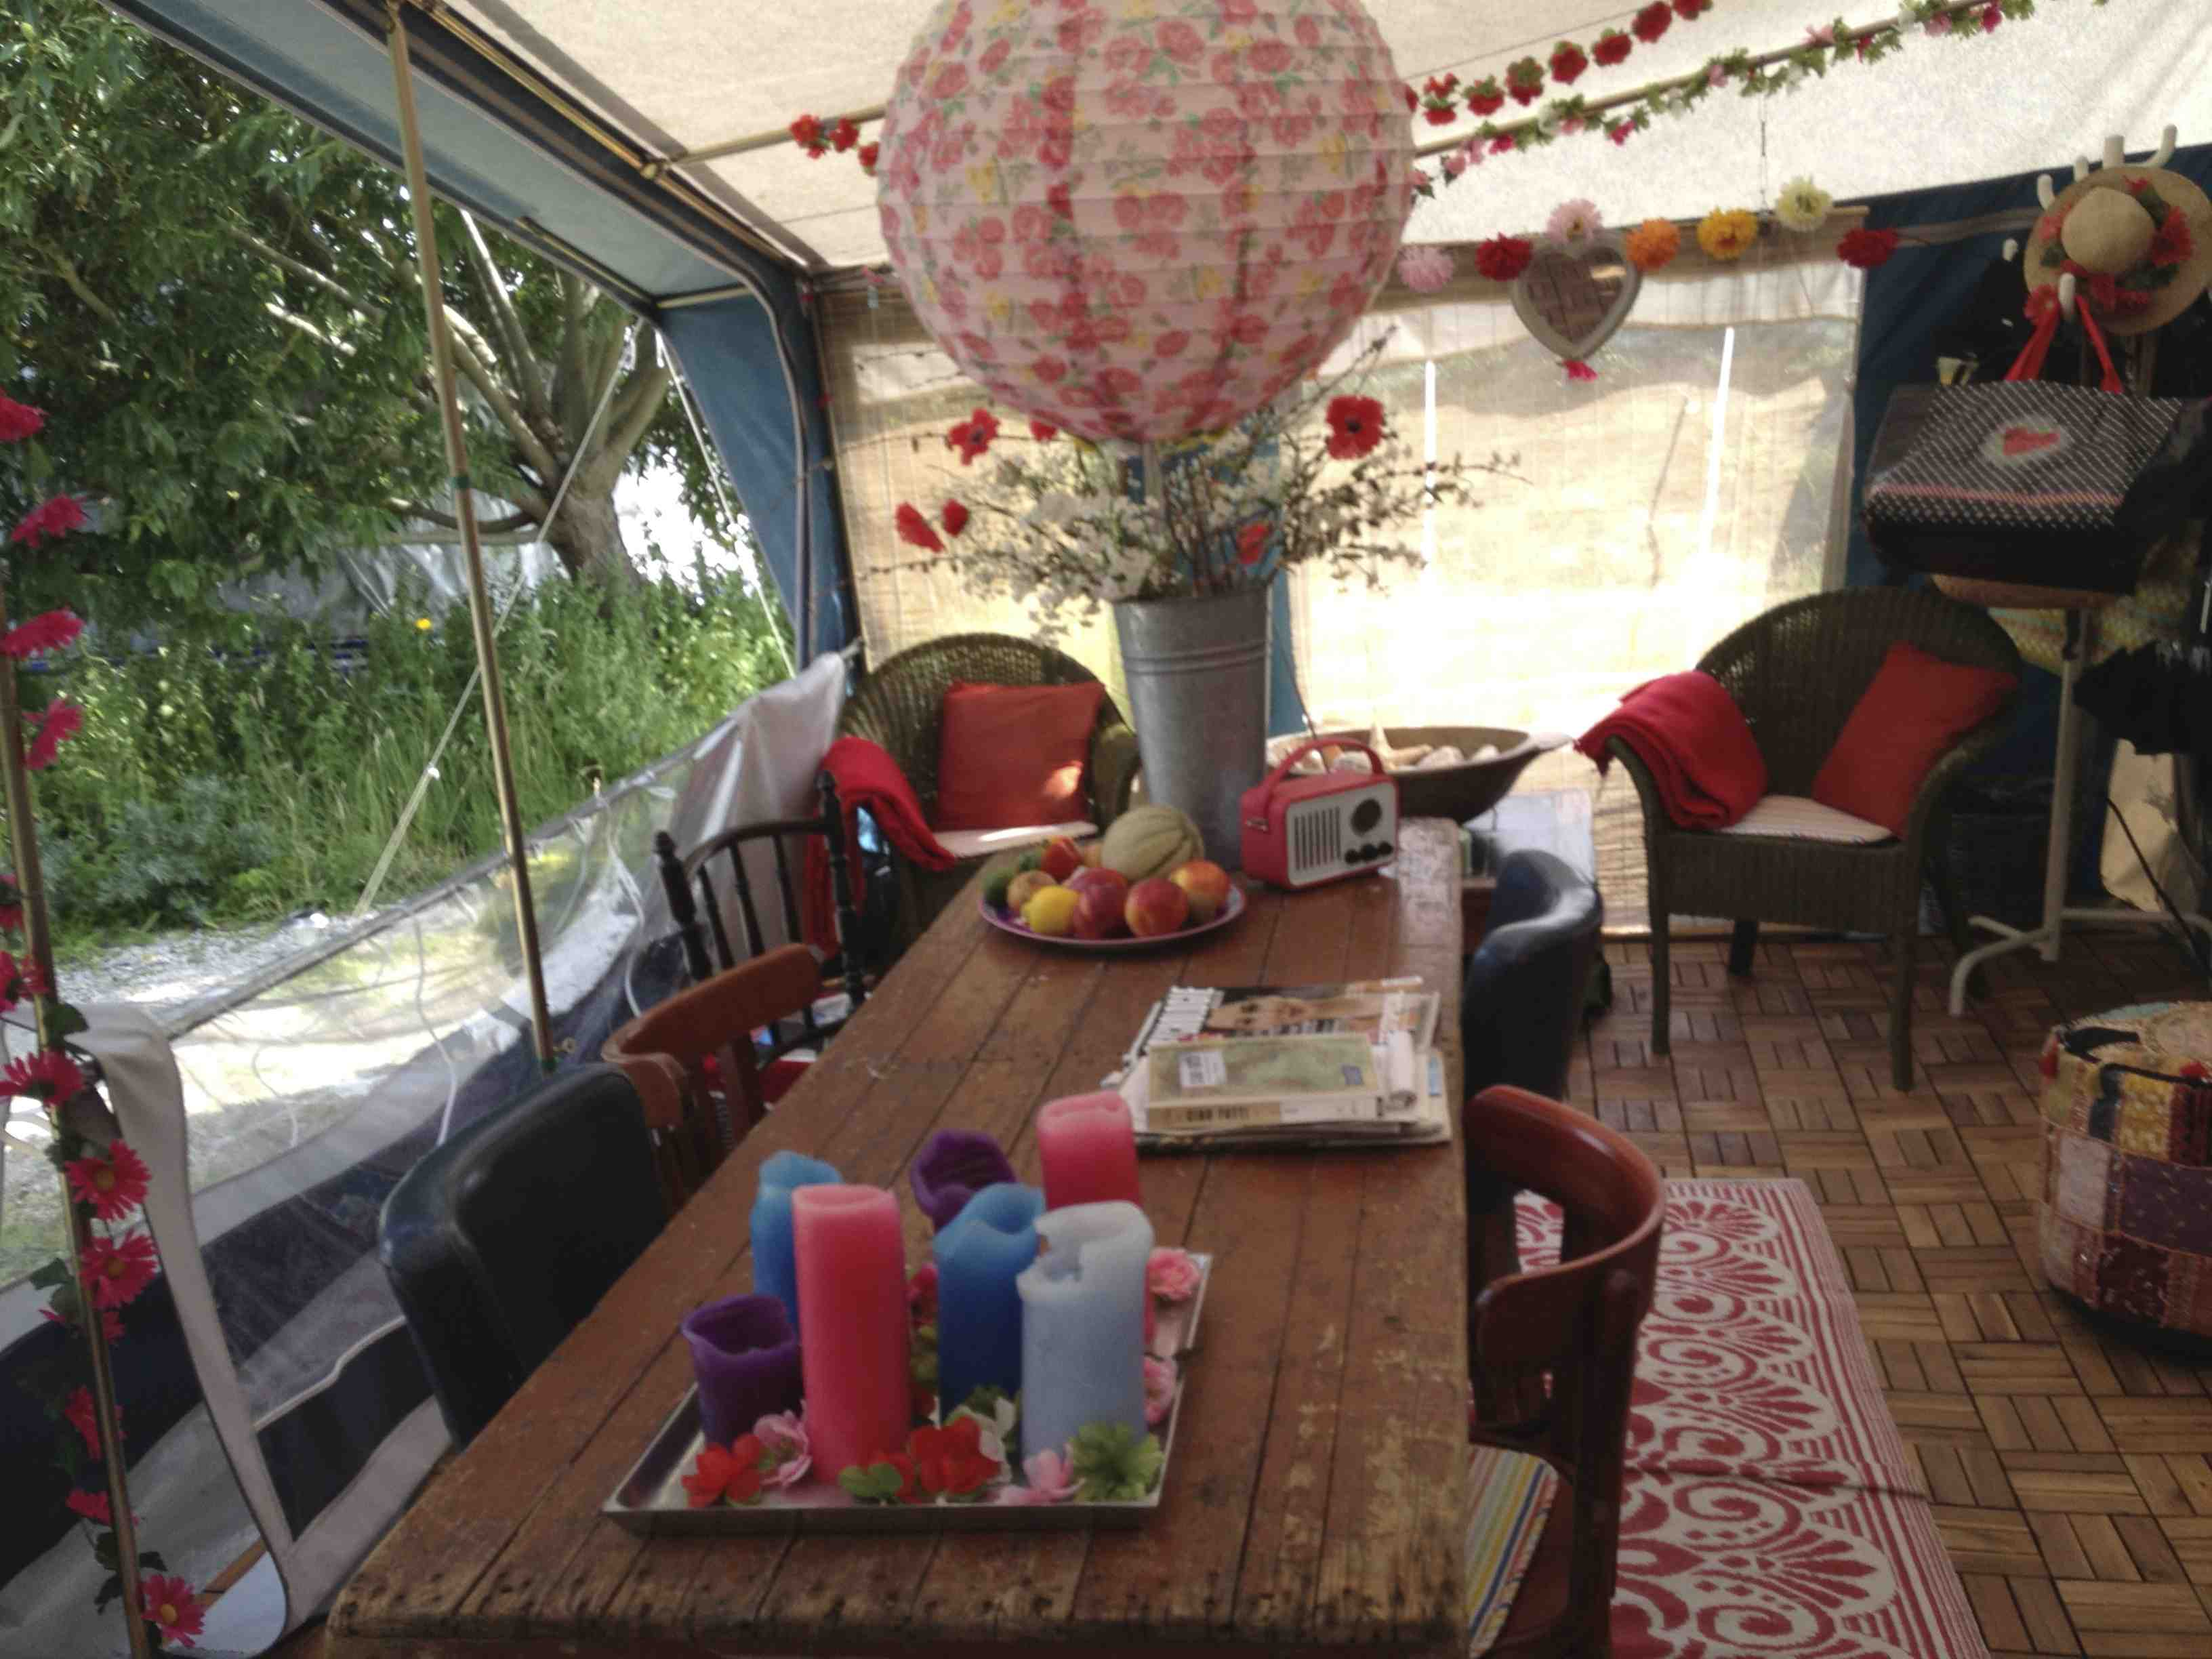 Vloer houten vloer leggen in voortent : Dit doe je met die saaie voortent u2039 Caravanity : happy campers ...